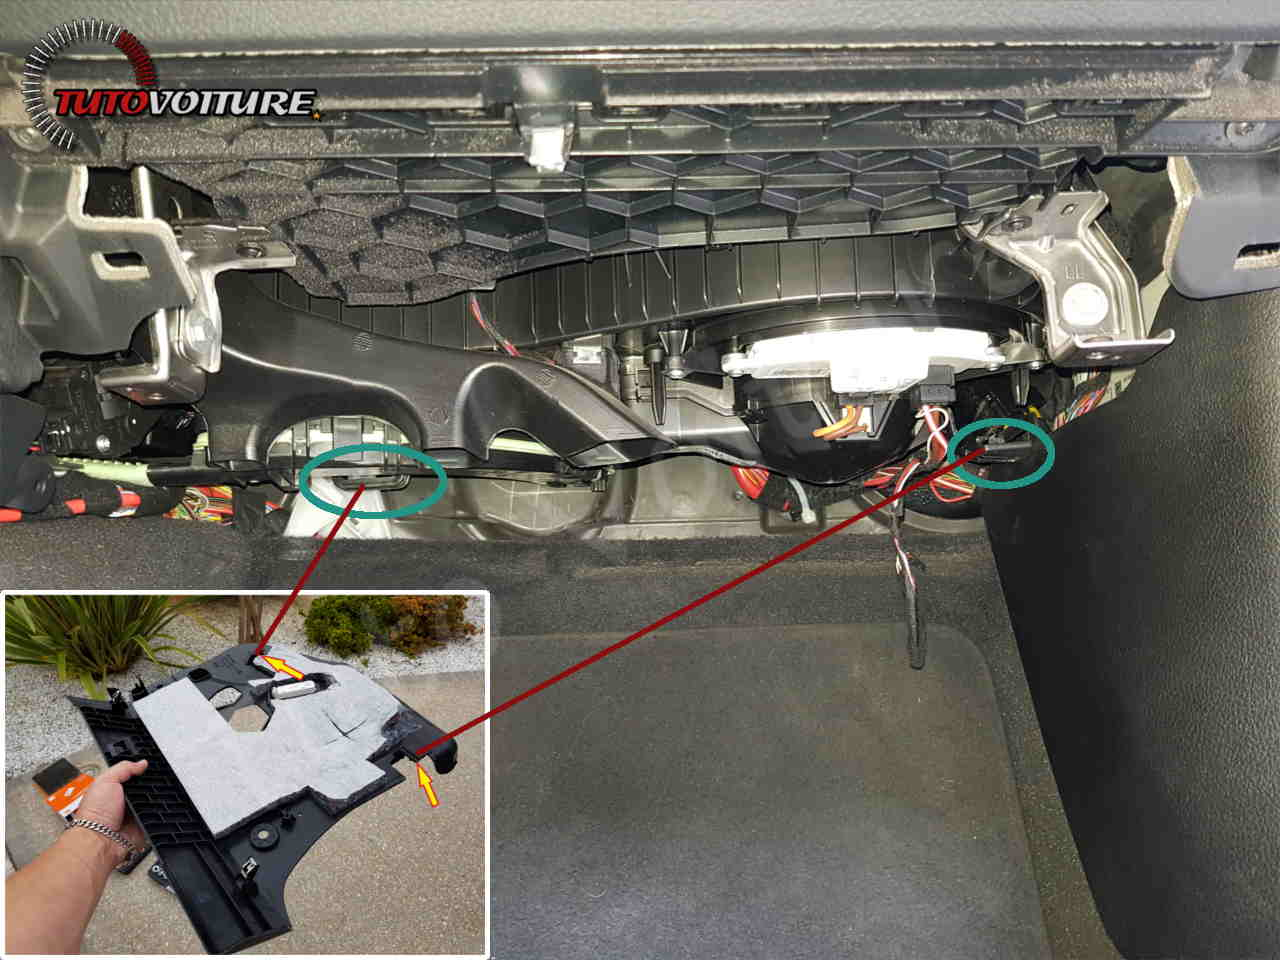 Changer son filtre cabine bmw serie 3 - F30